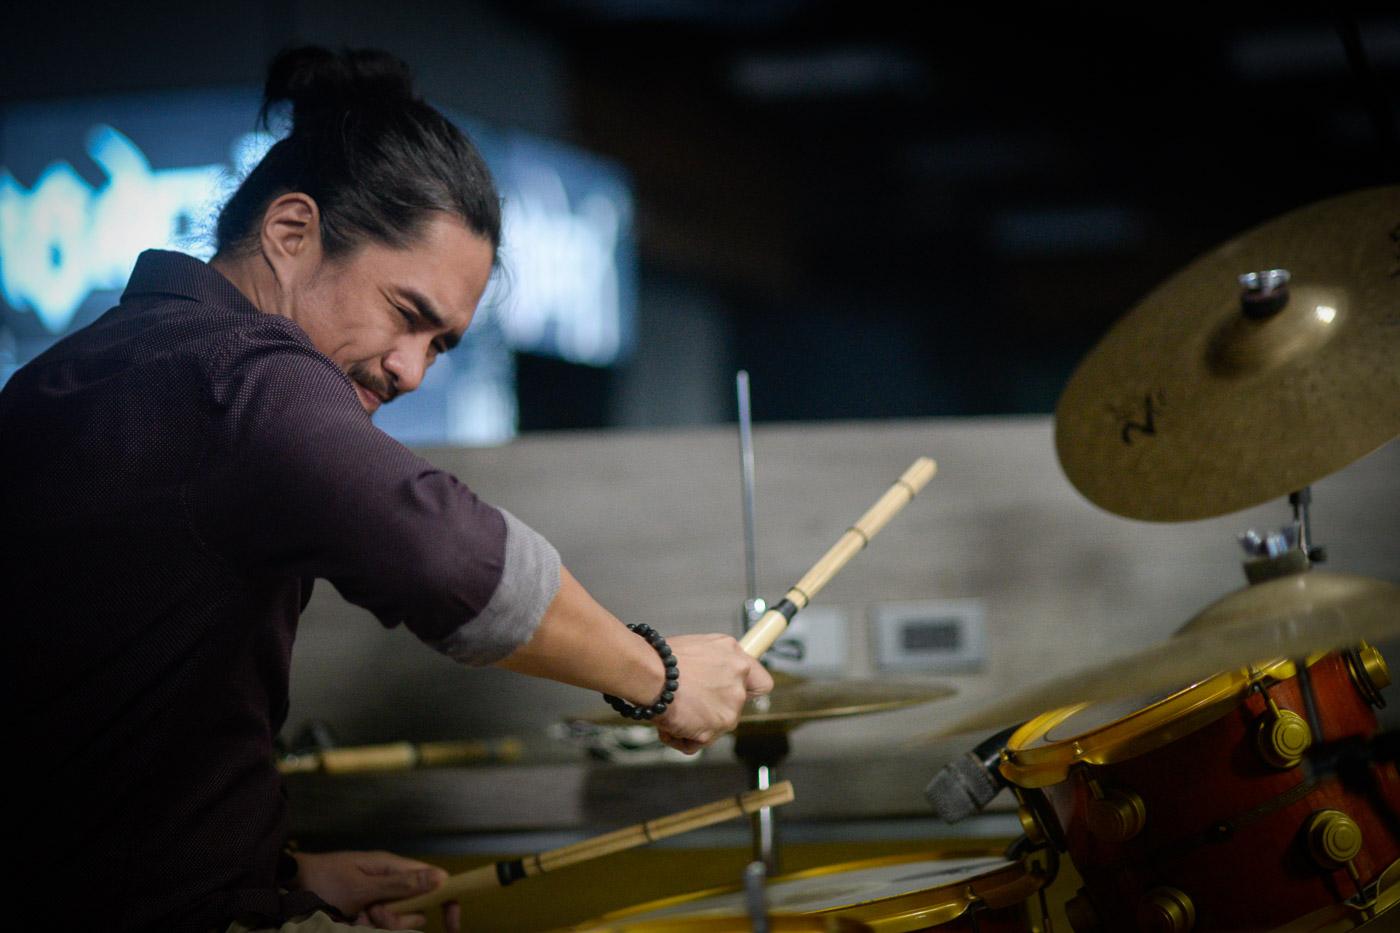 RAZORBACK. The late Brian Velasco performs on Rappler Live Jam in 2016. File photo by LeAnnne Jazul/Rappler